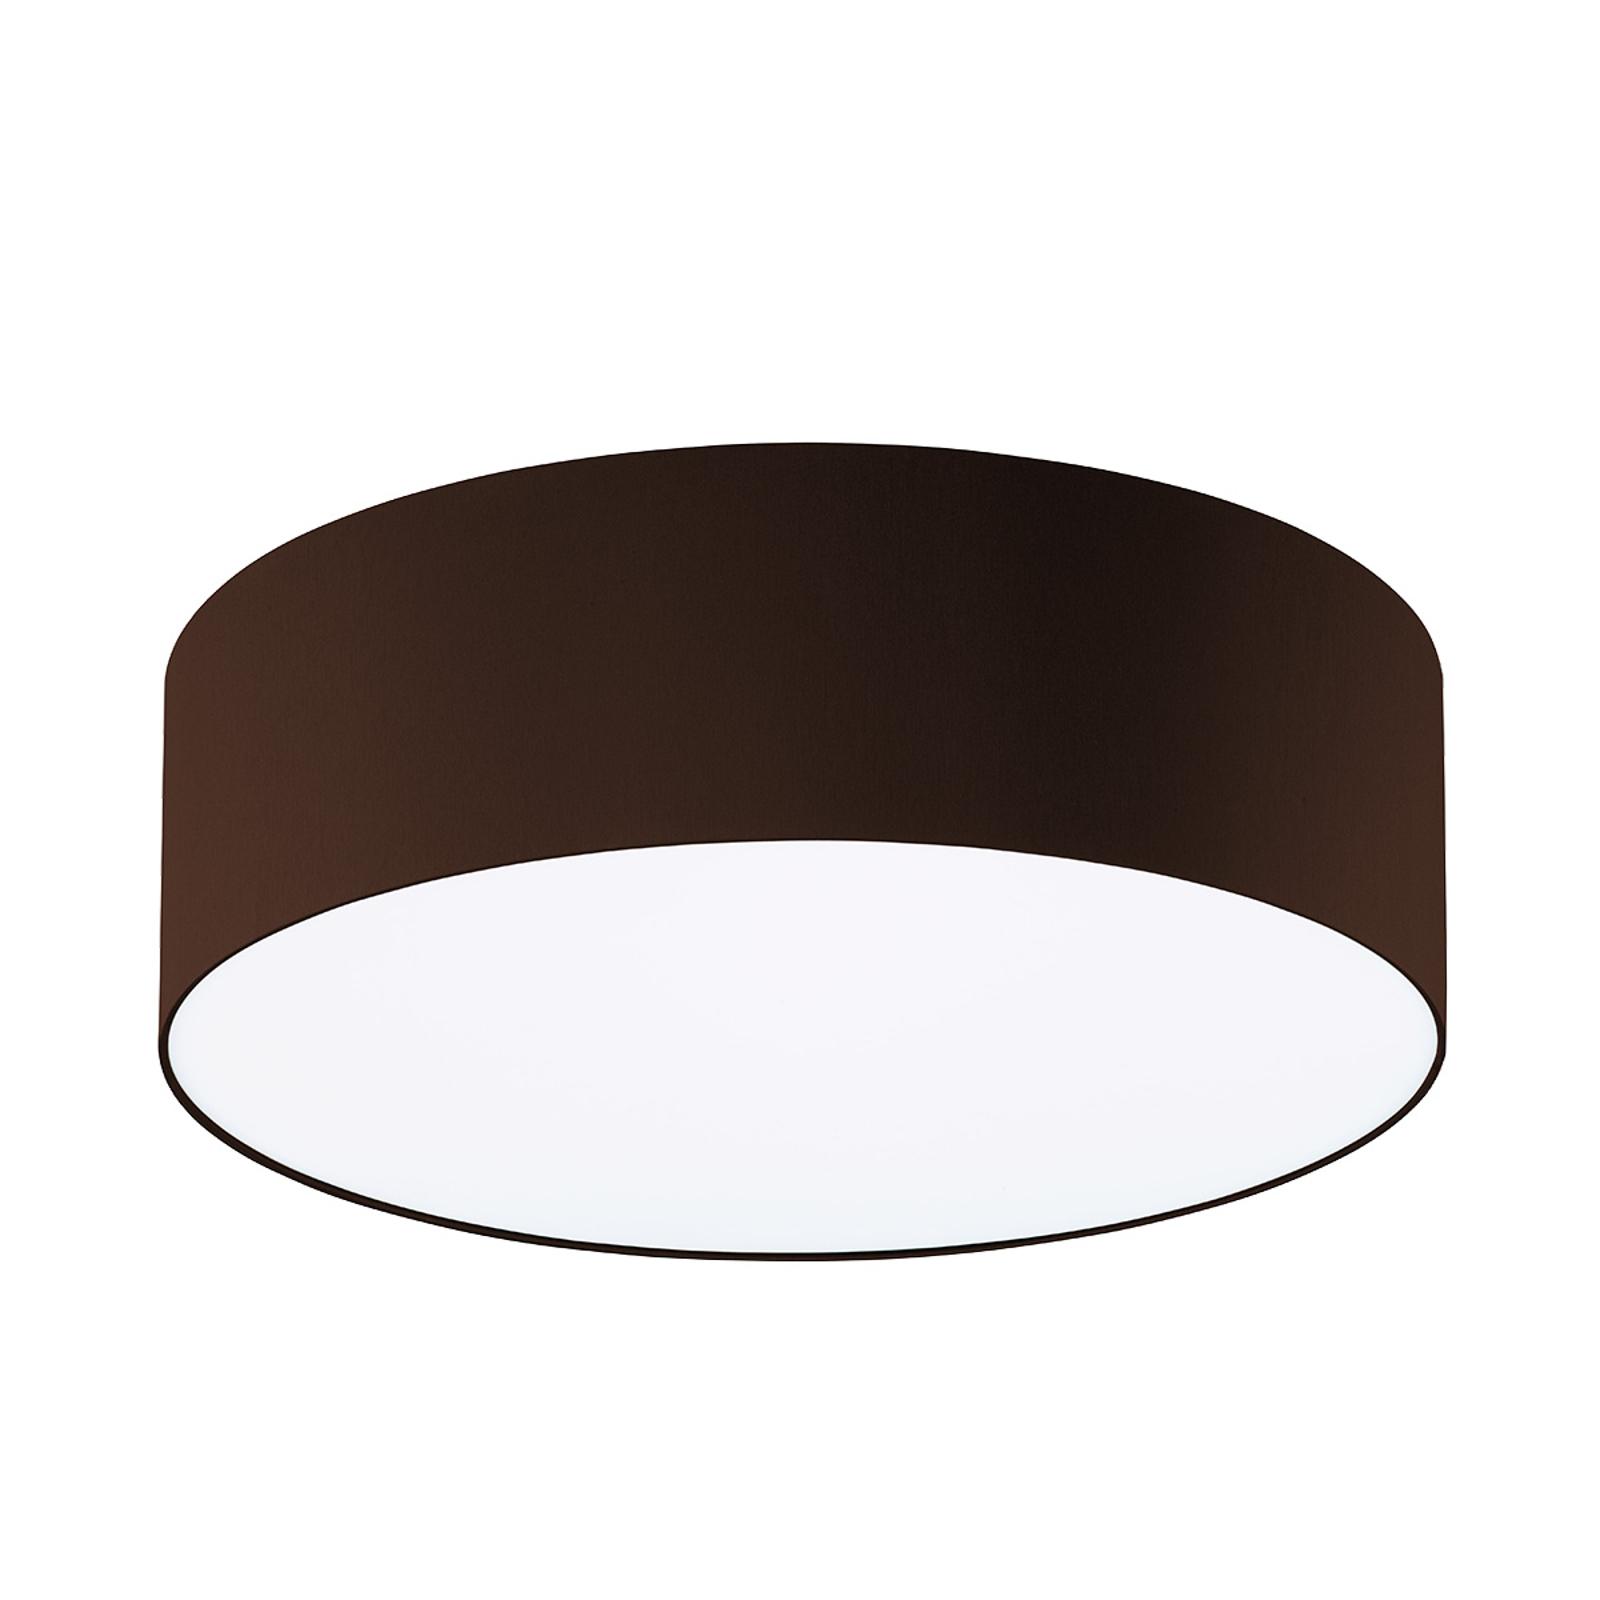 Mokkabruine plafondlamp Mara, 50 cm